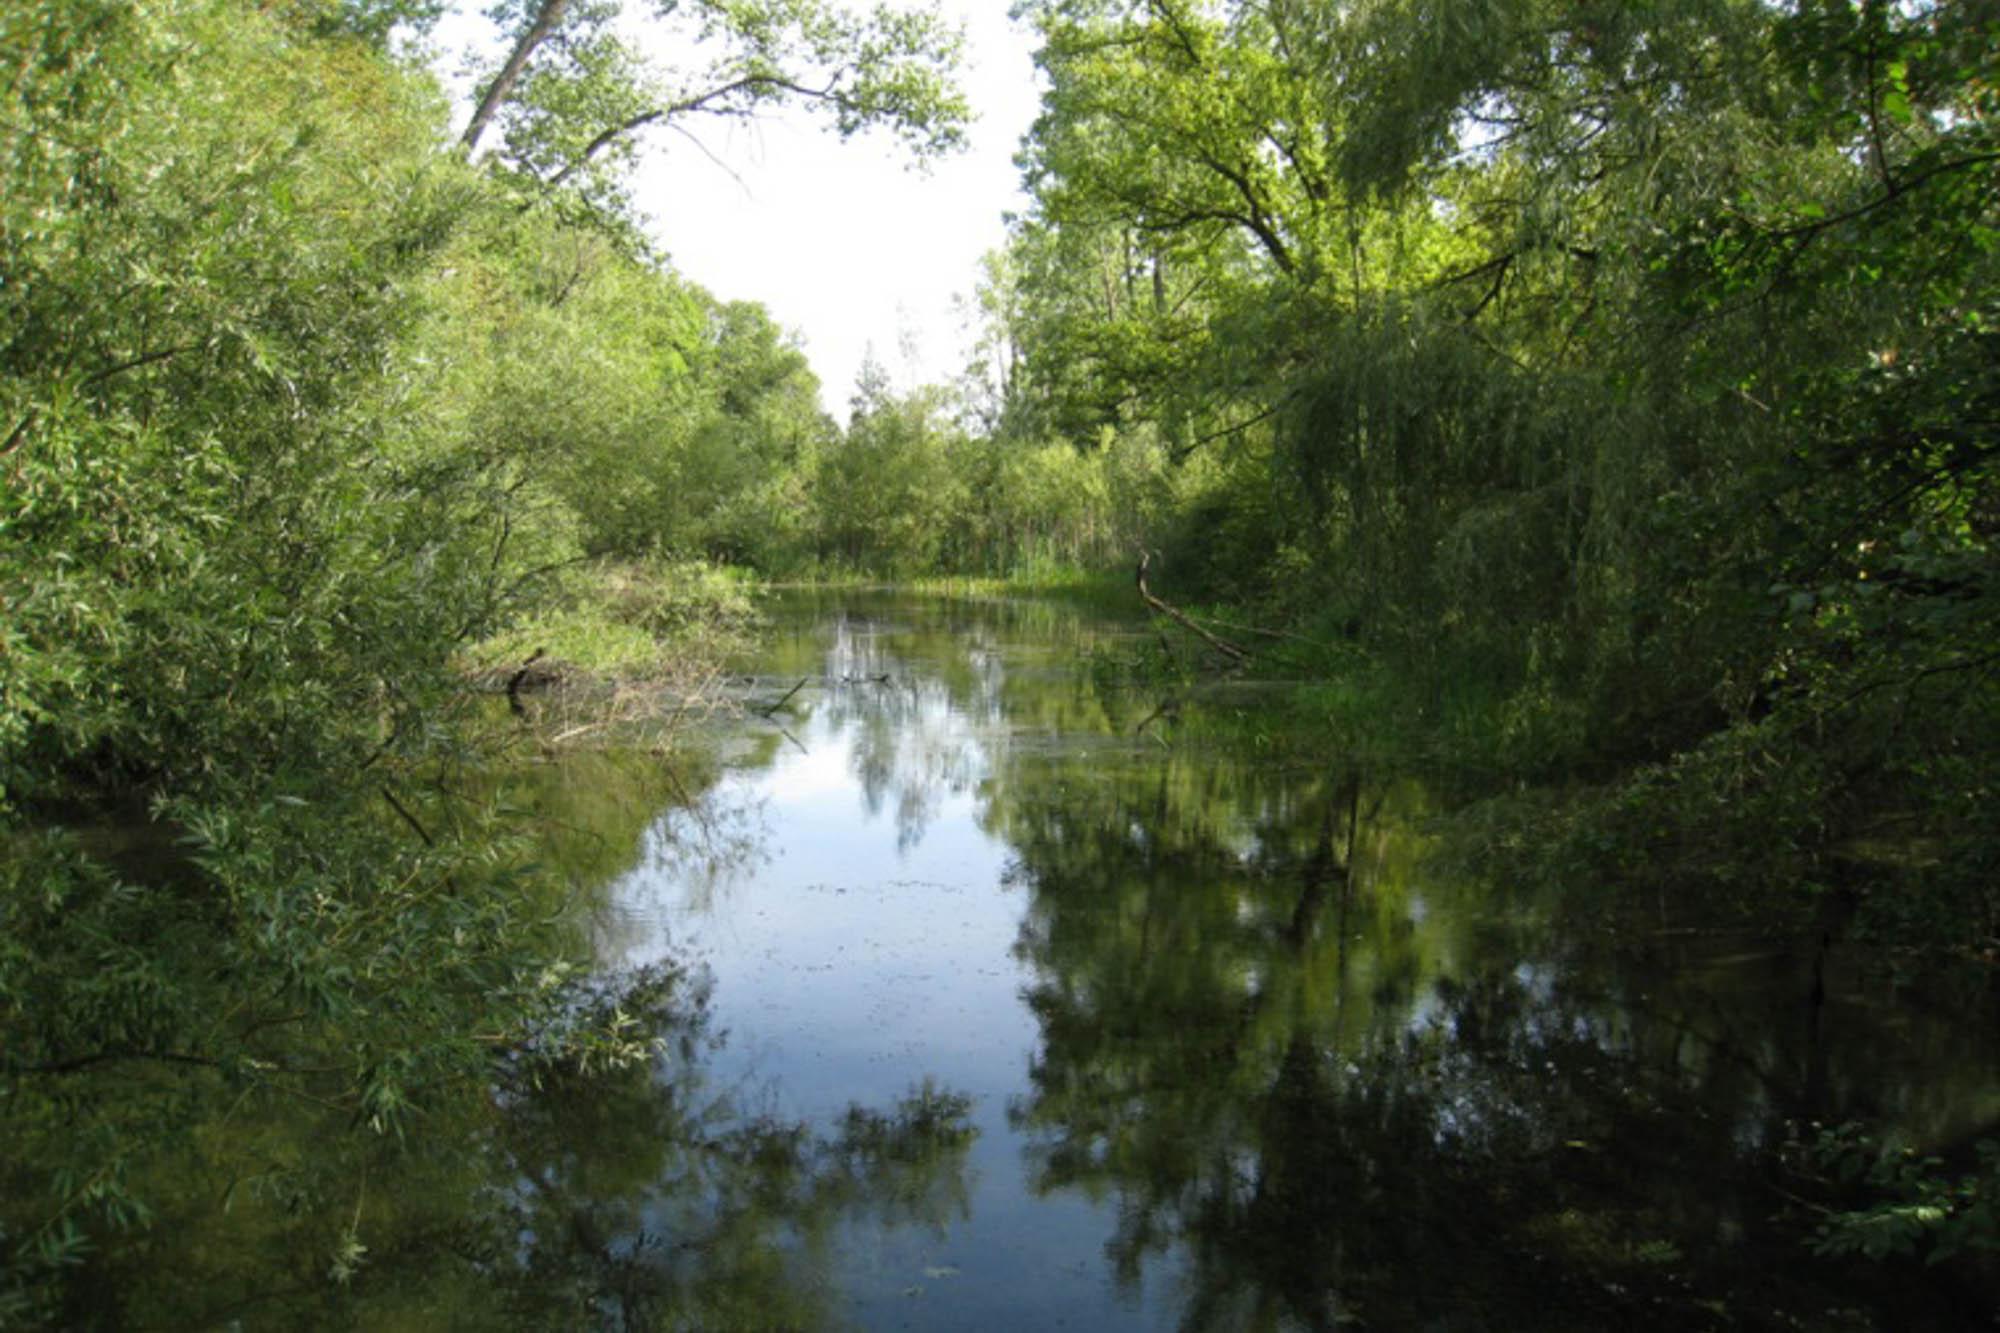 Biotop bei Taubergießen nähe Europapark